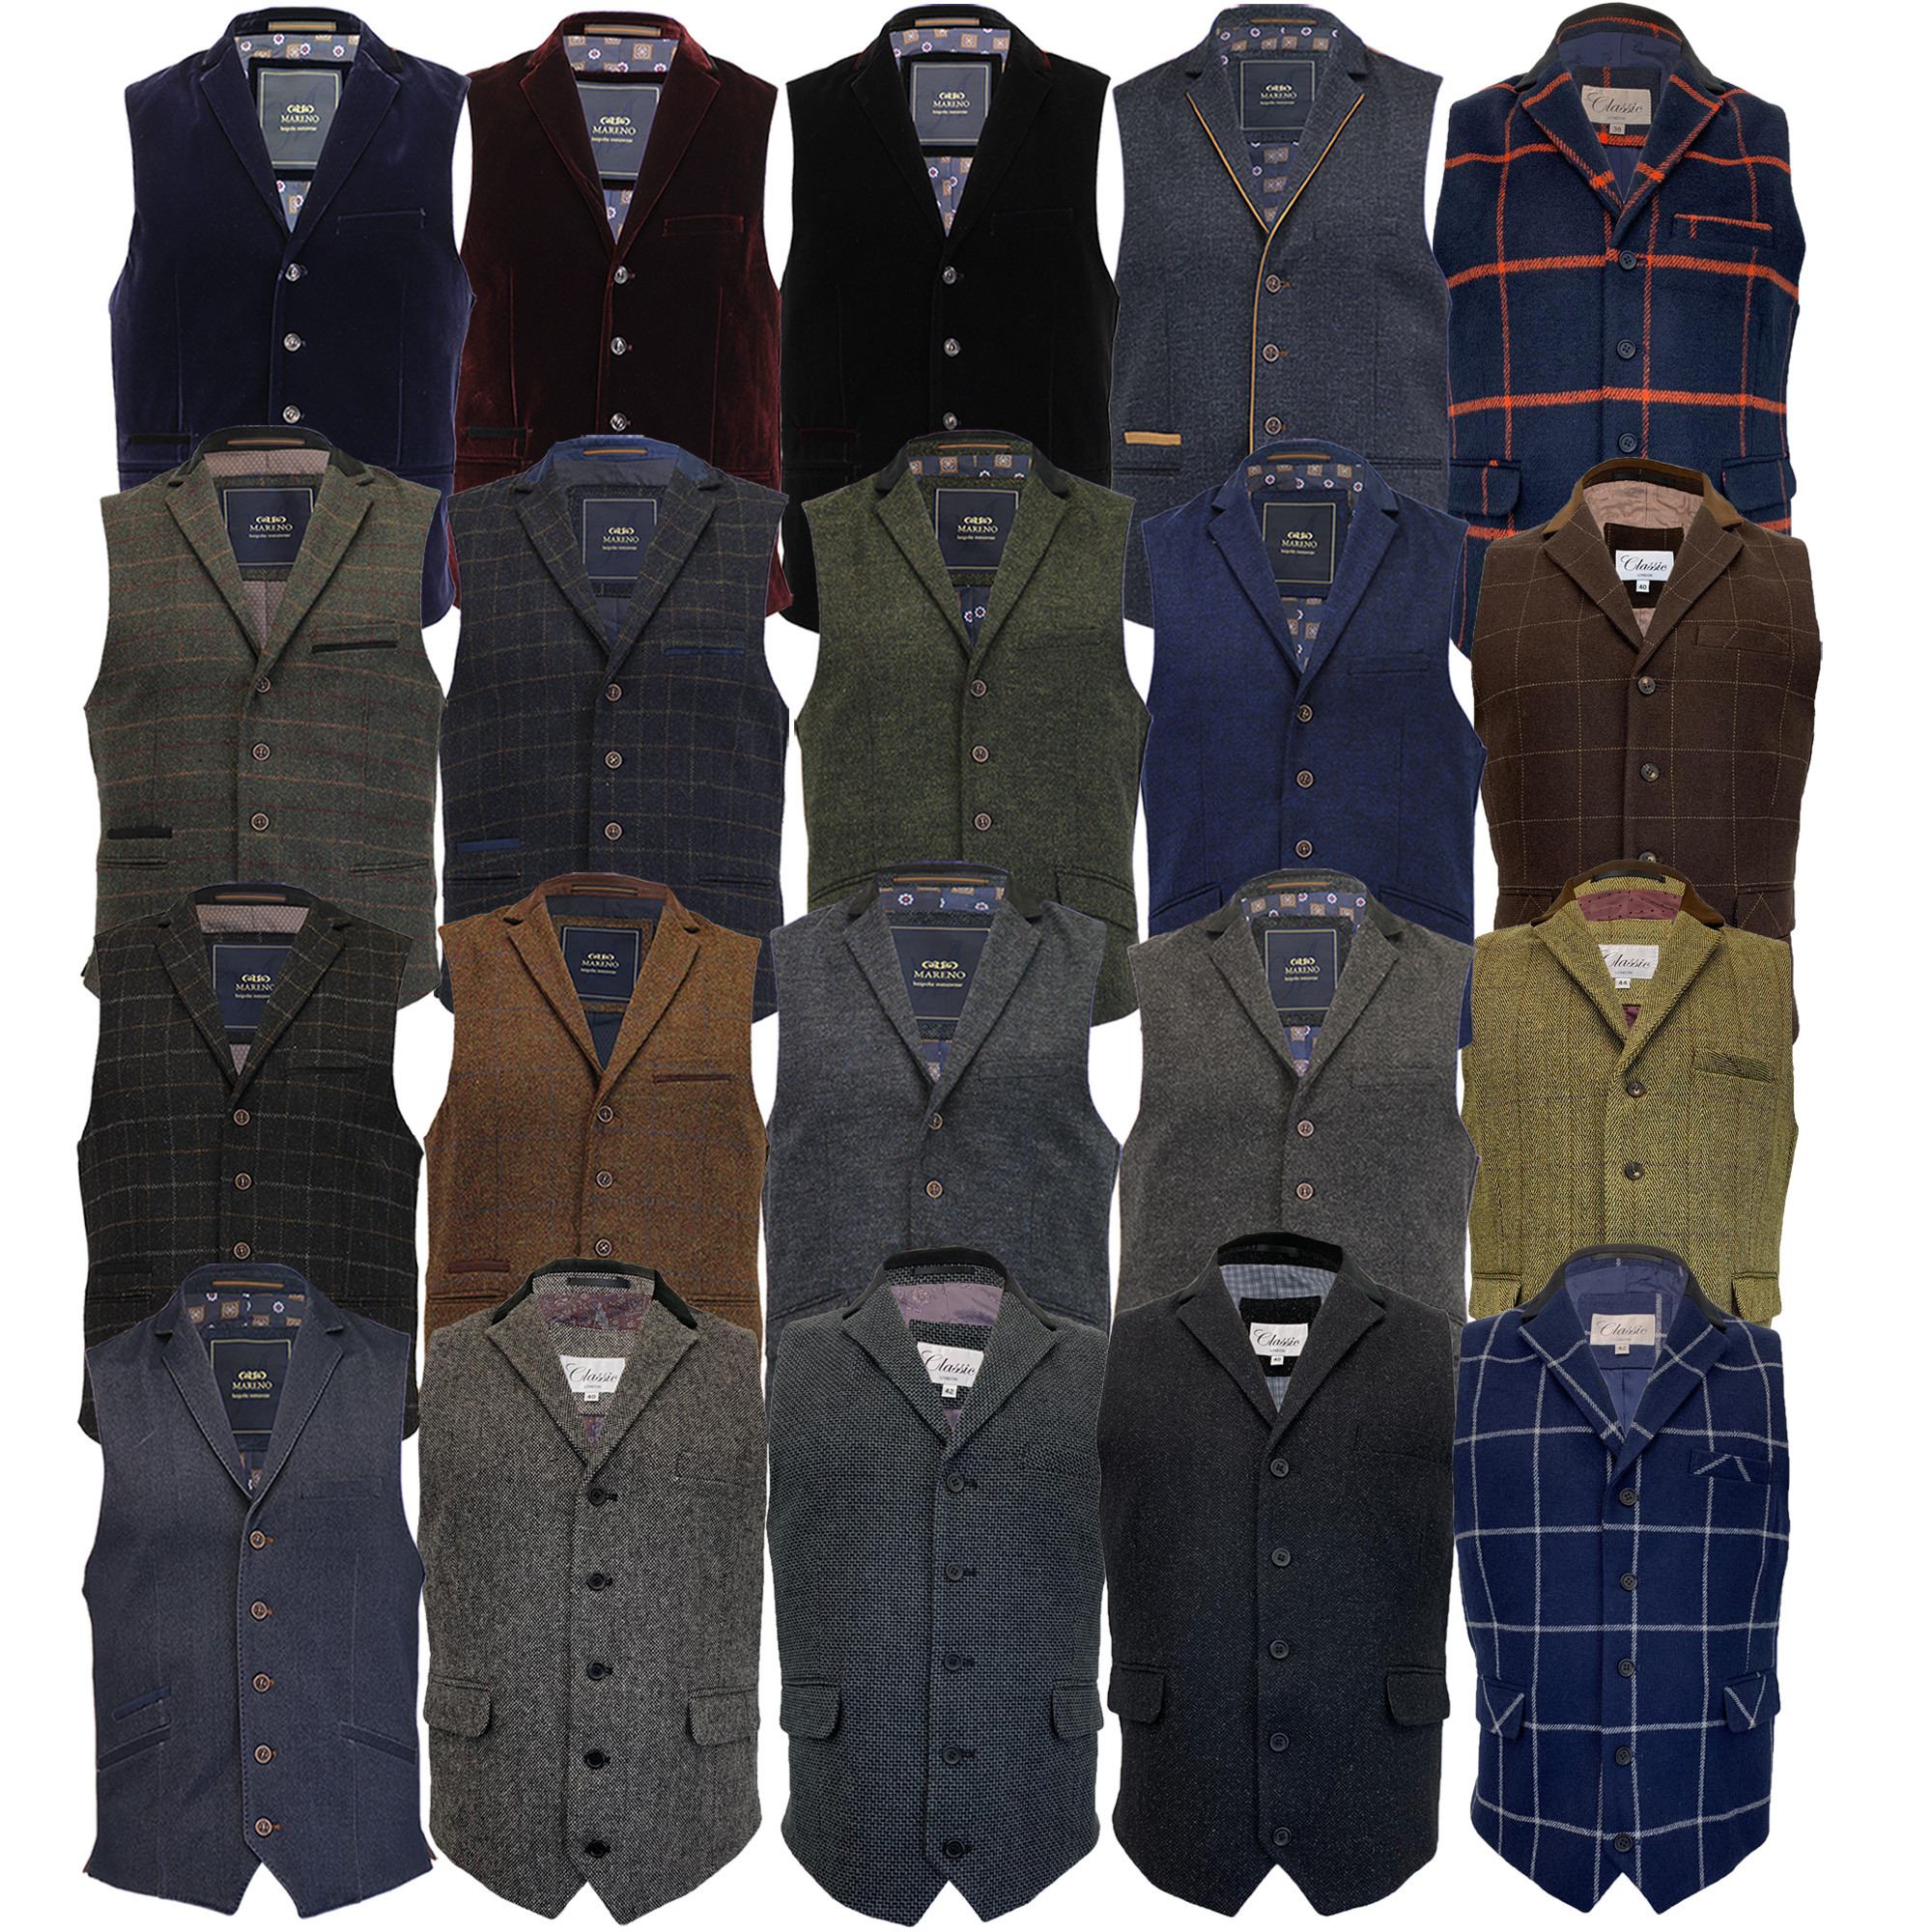 Mens-MARENO-Waistcoat-Wool-Mix-Formal-Vest-Herringbone-Tweed-Check-Velvet-Lined thumbnail 8